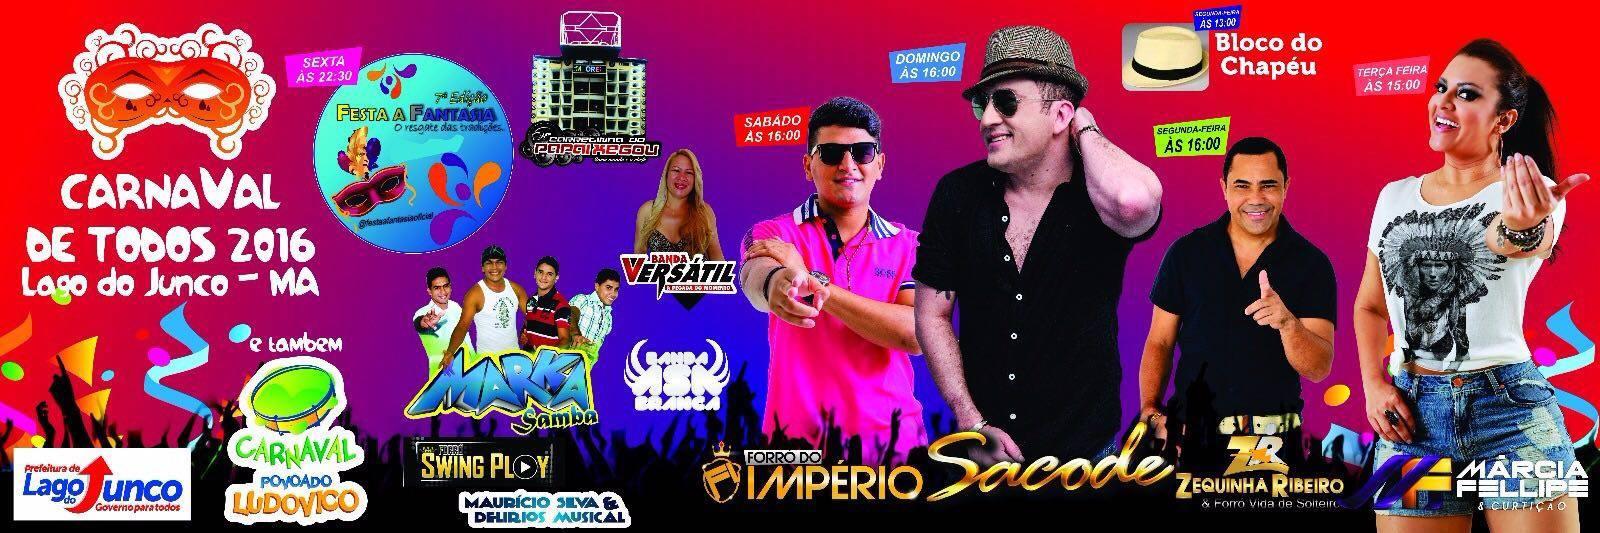 Carnaval de Todos - Lago do Junco 2016